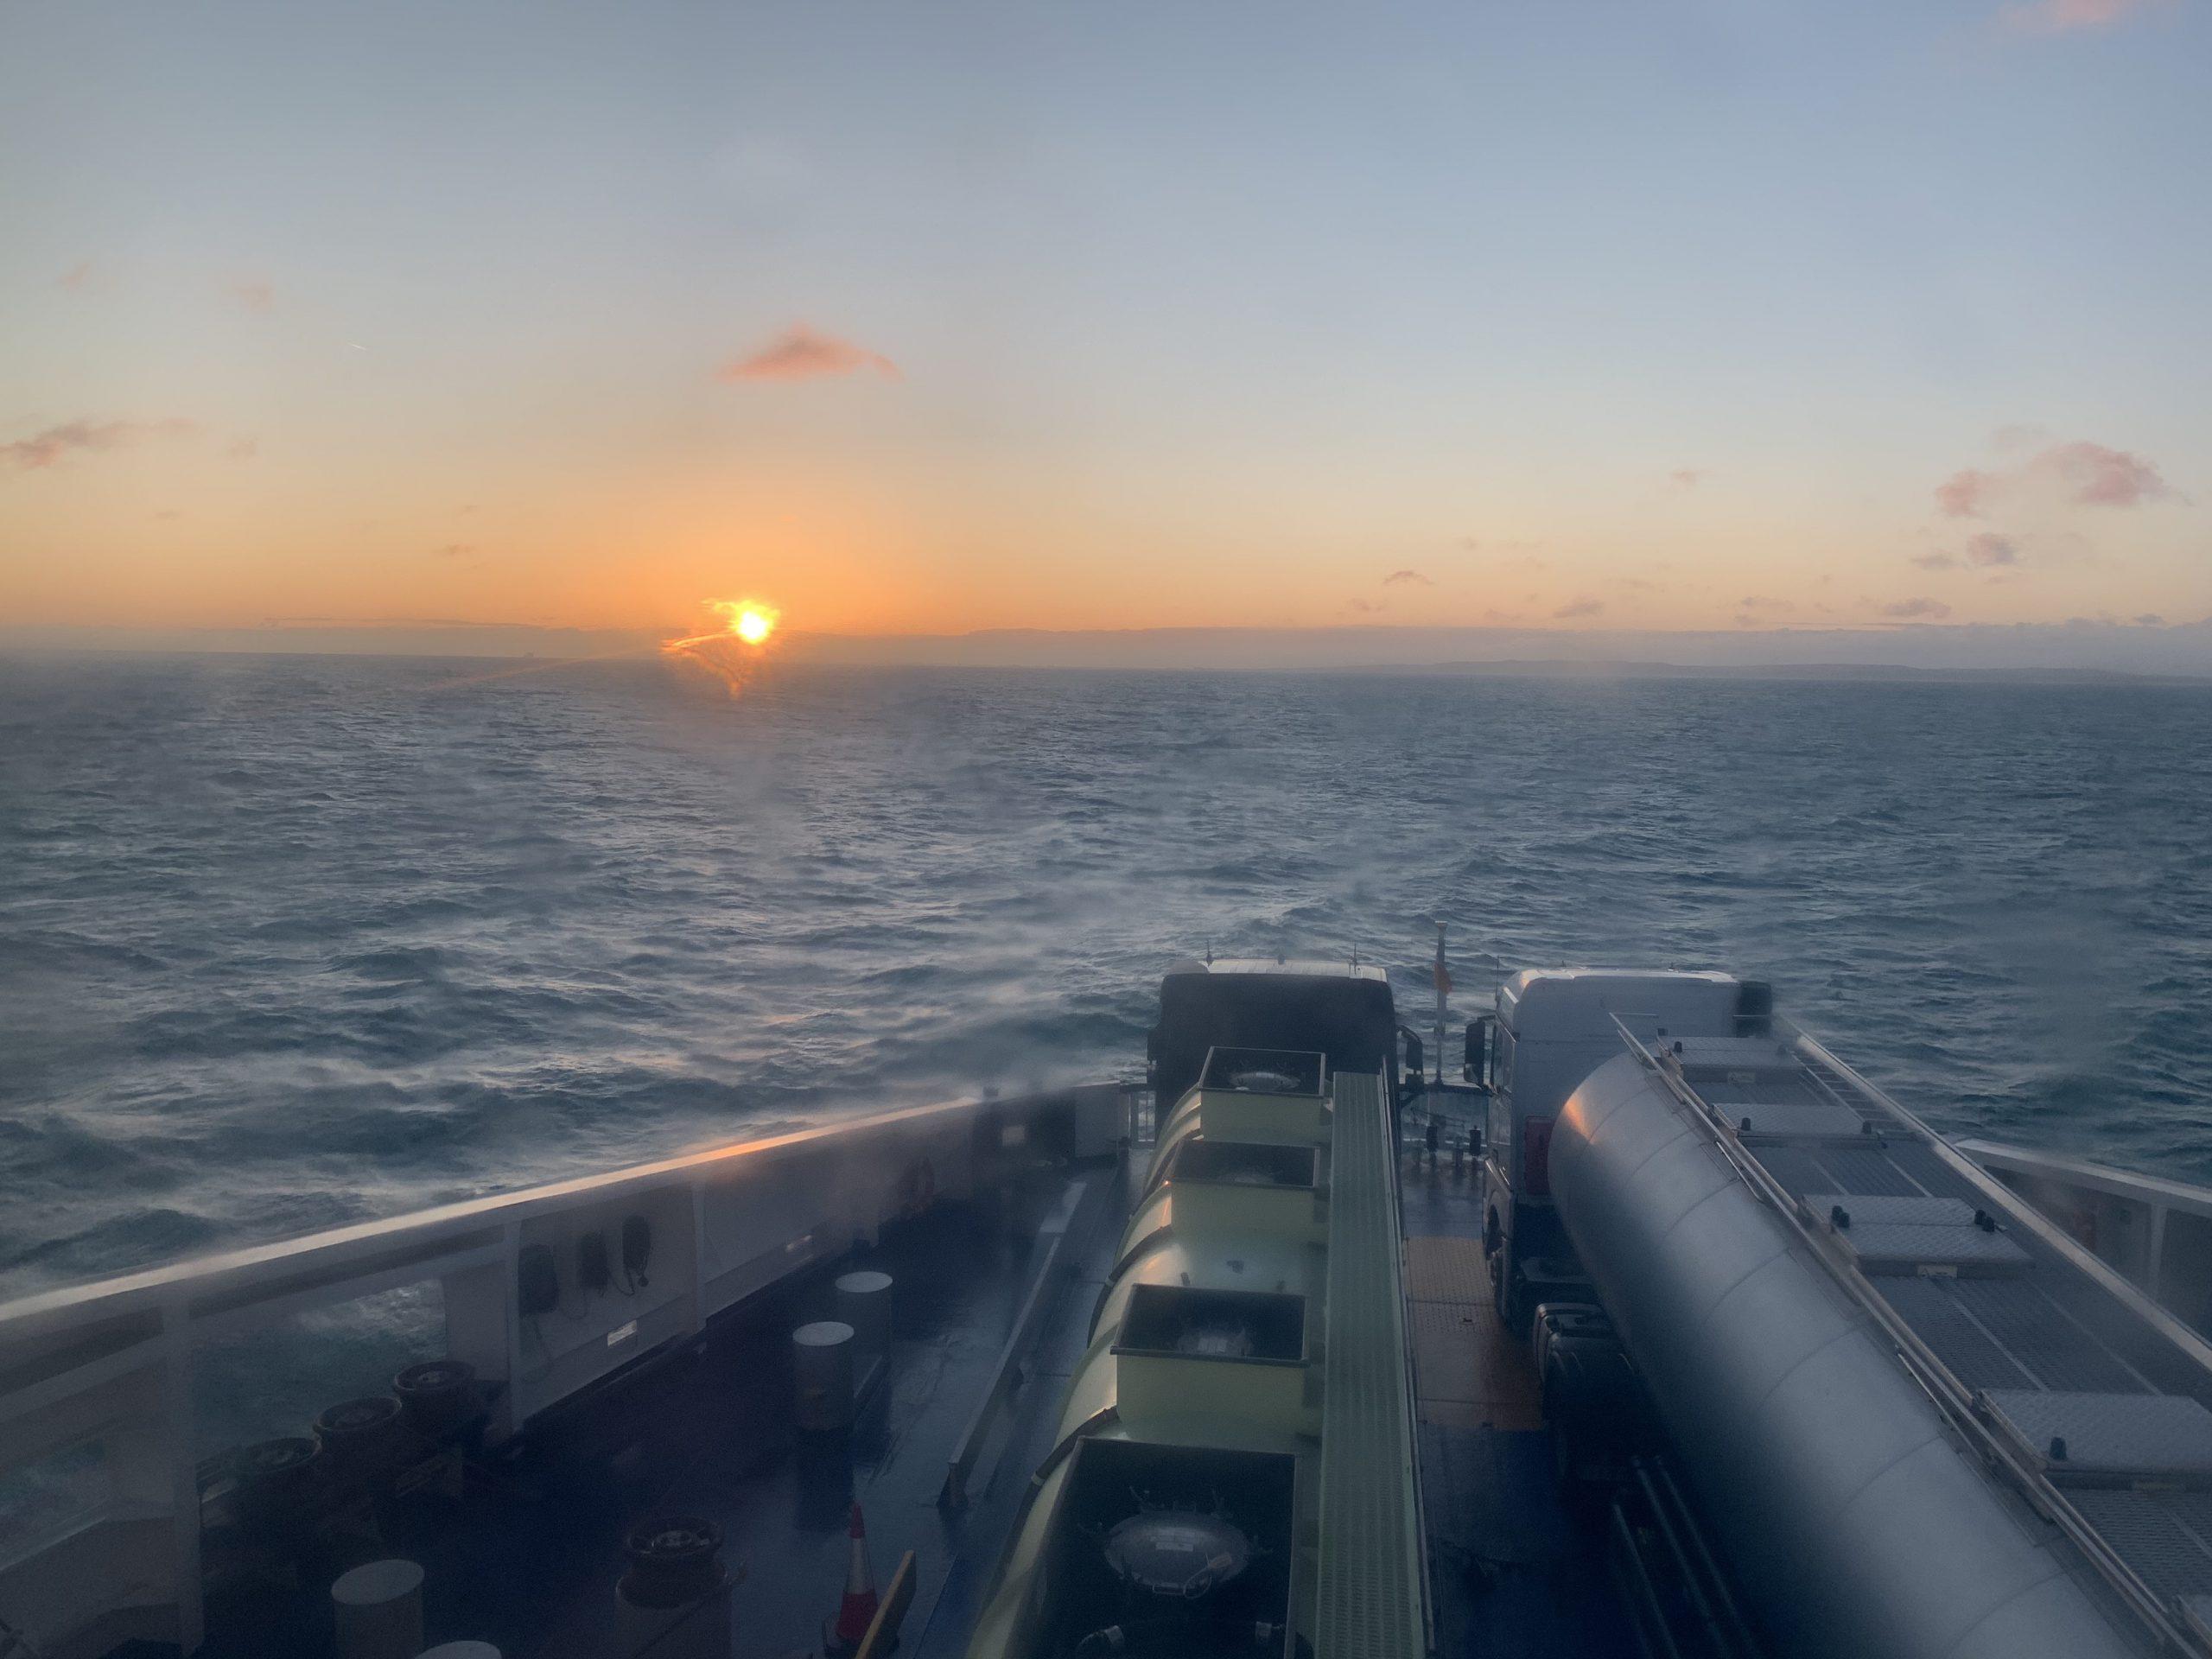 Sun set over sea on Ferry